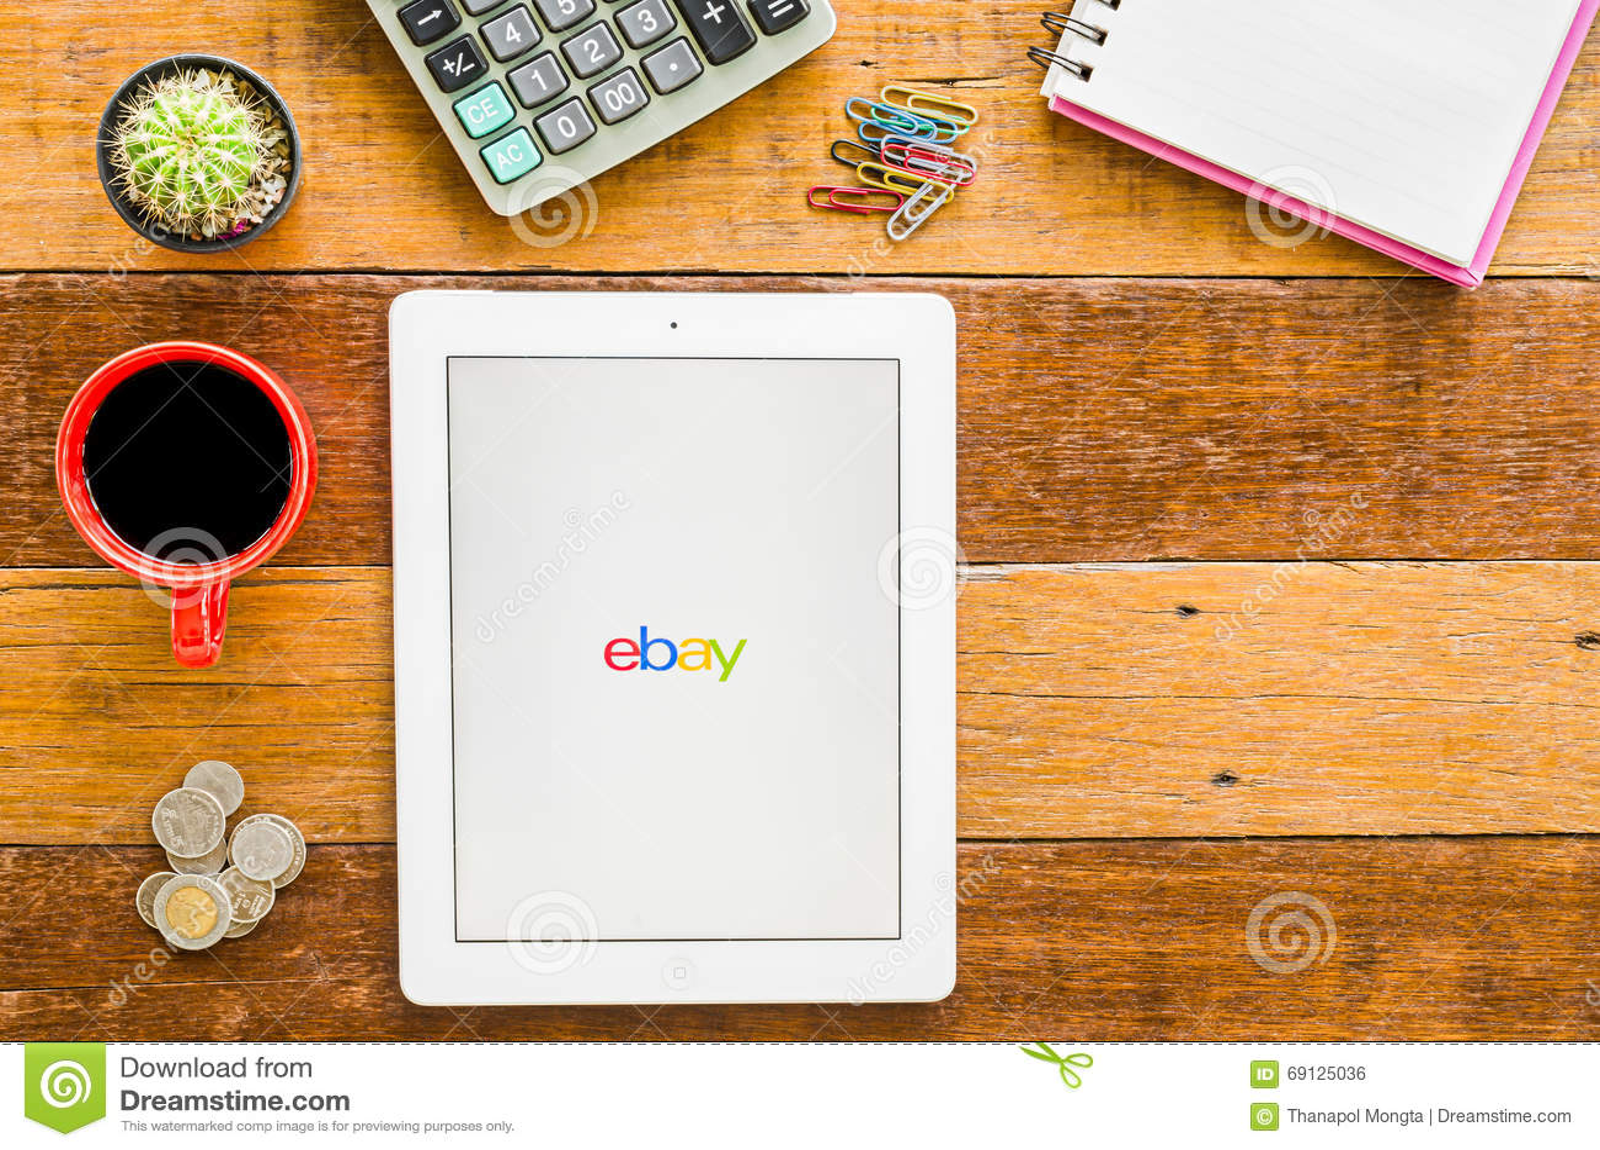 IPad 4 open ebay apps